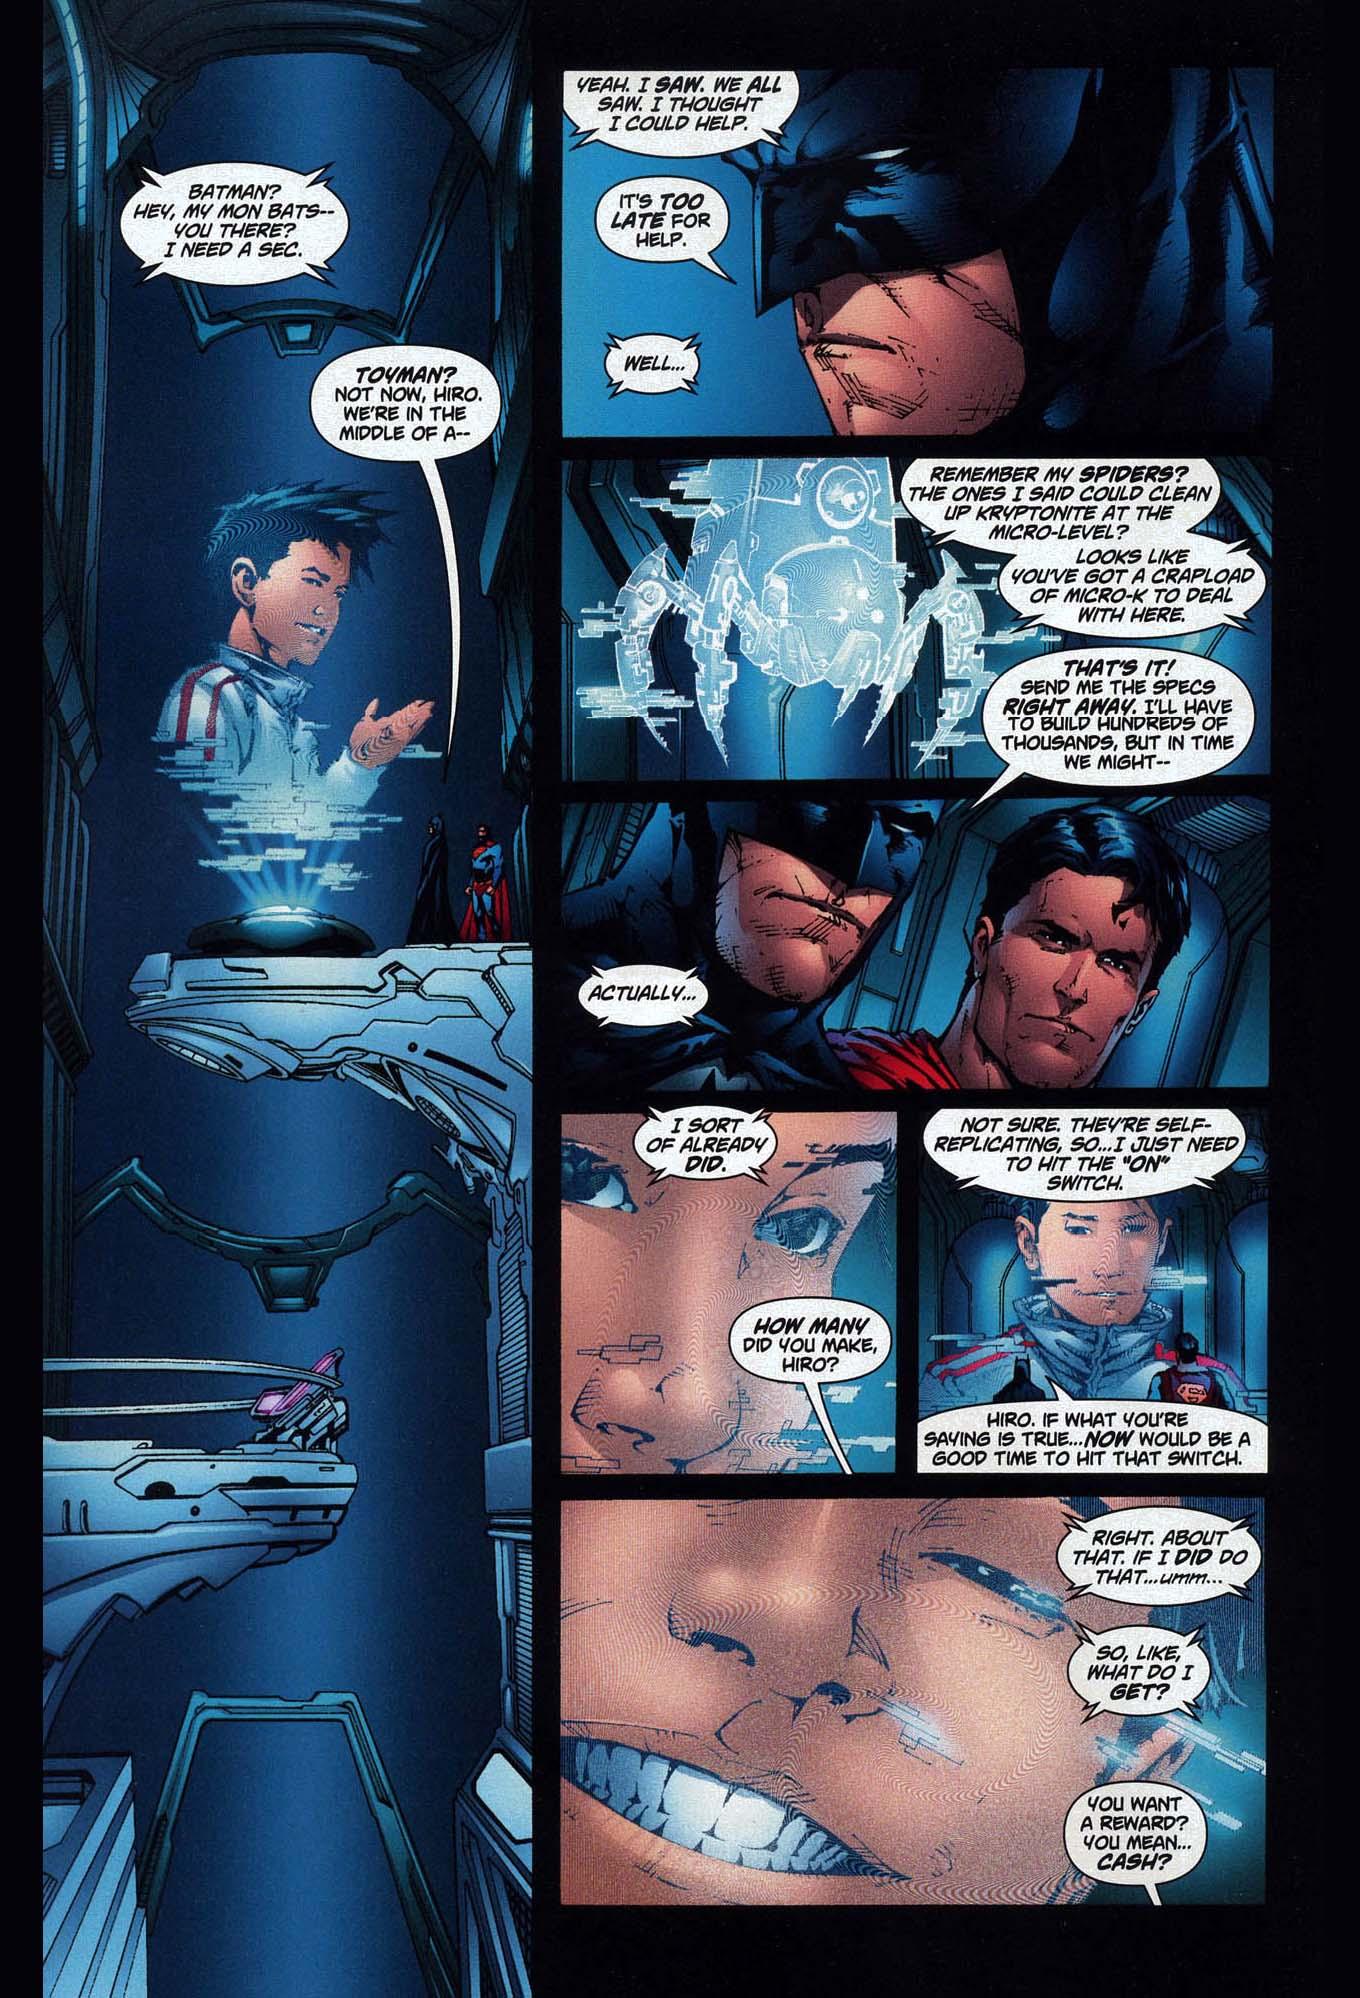 toyman's price for helping batman